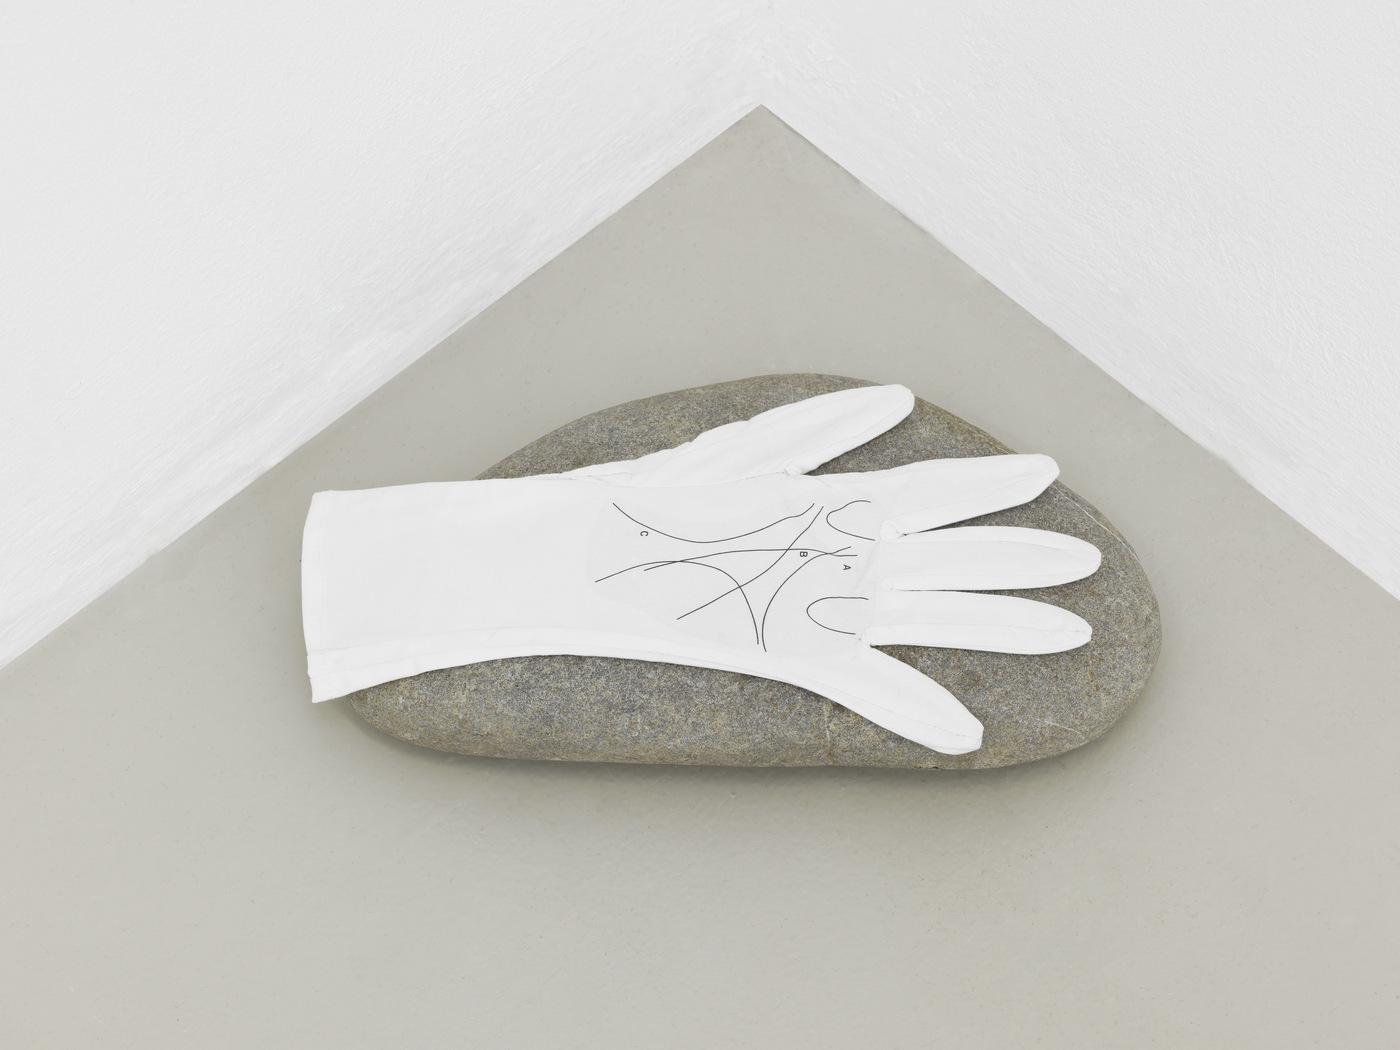 23_Gestures of Tomorrow_Nona Inescu